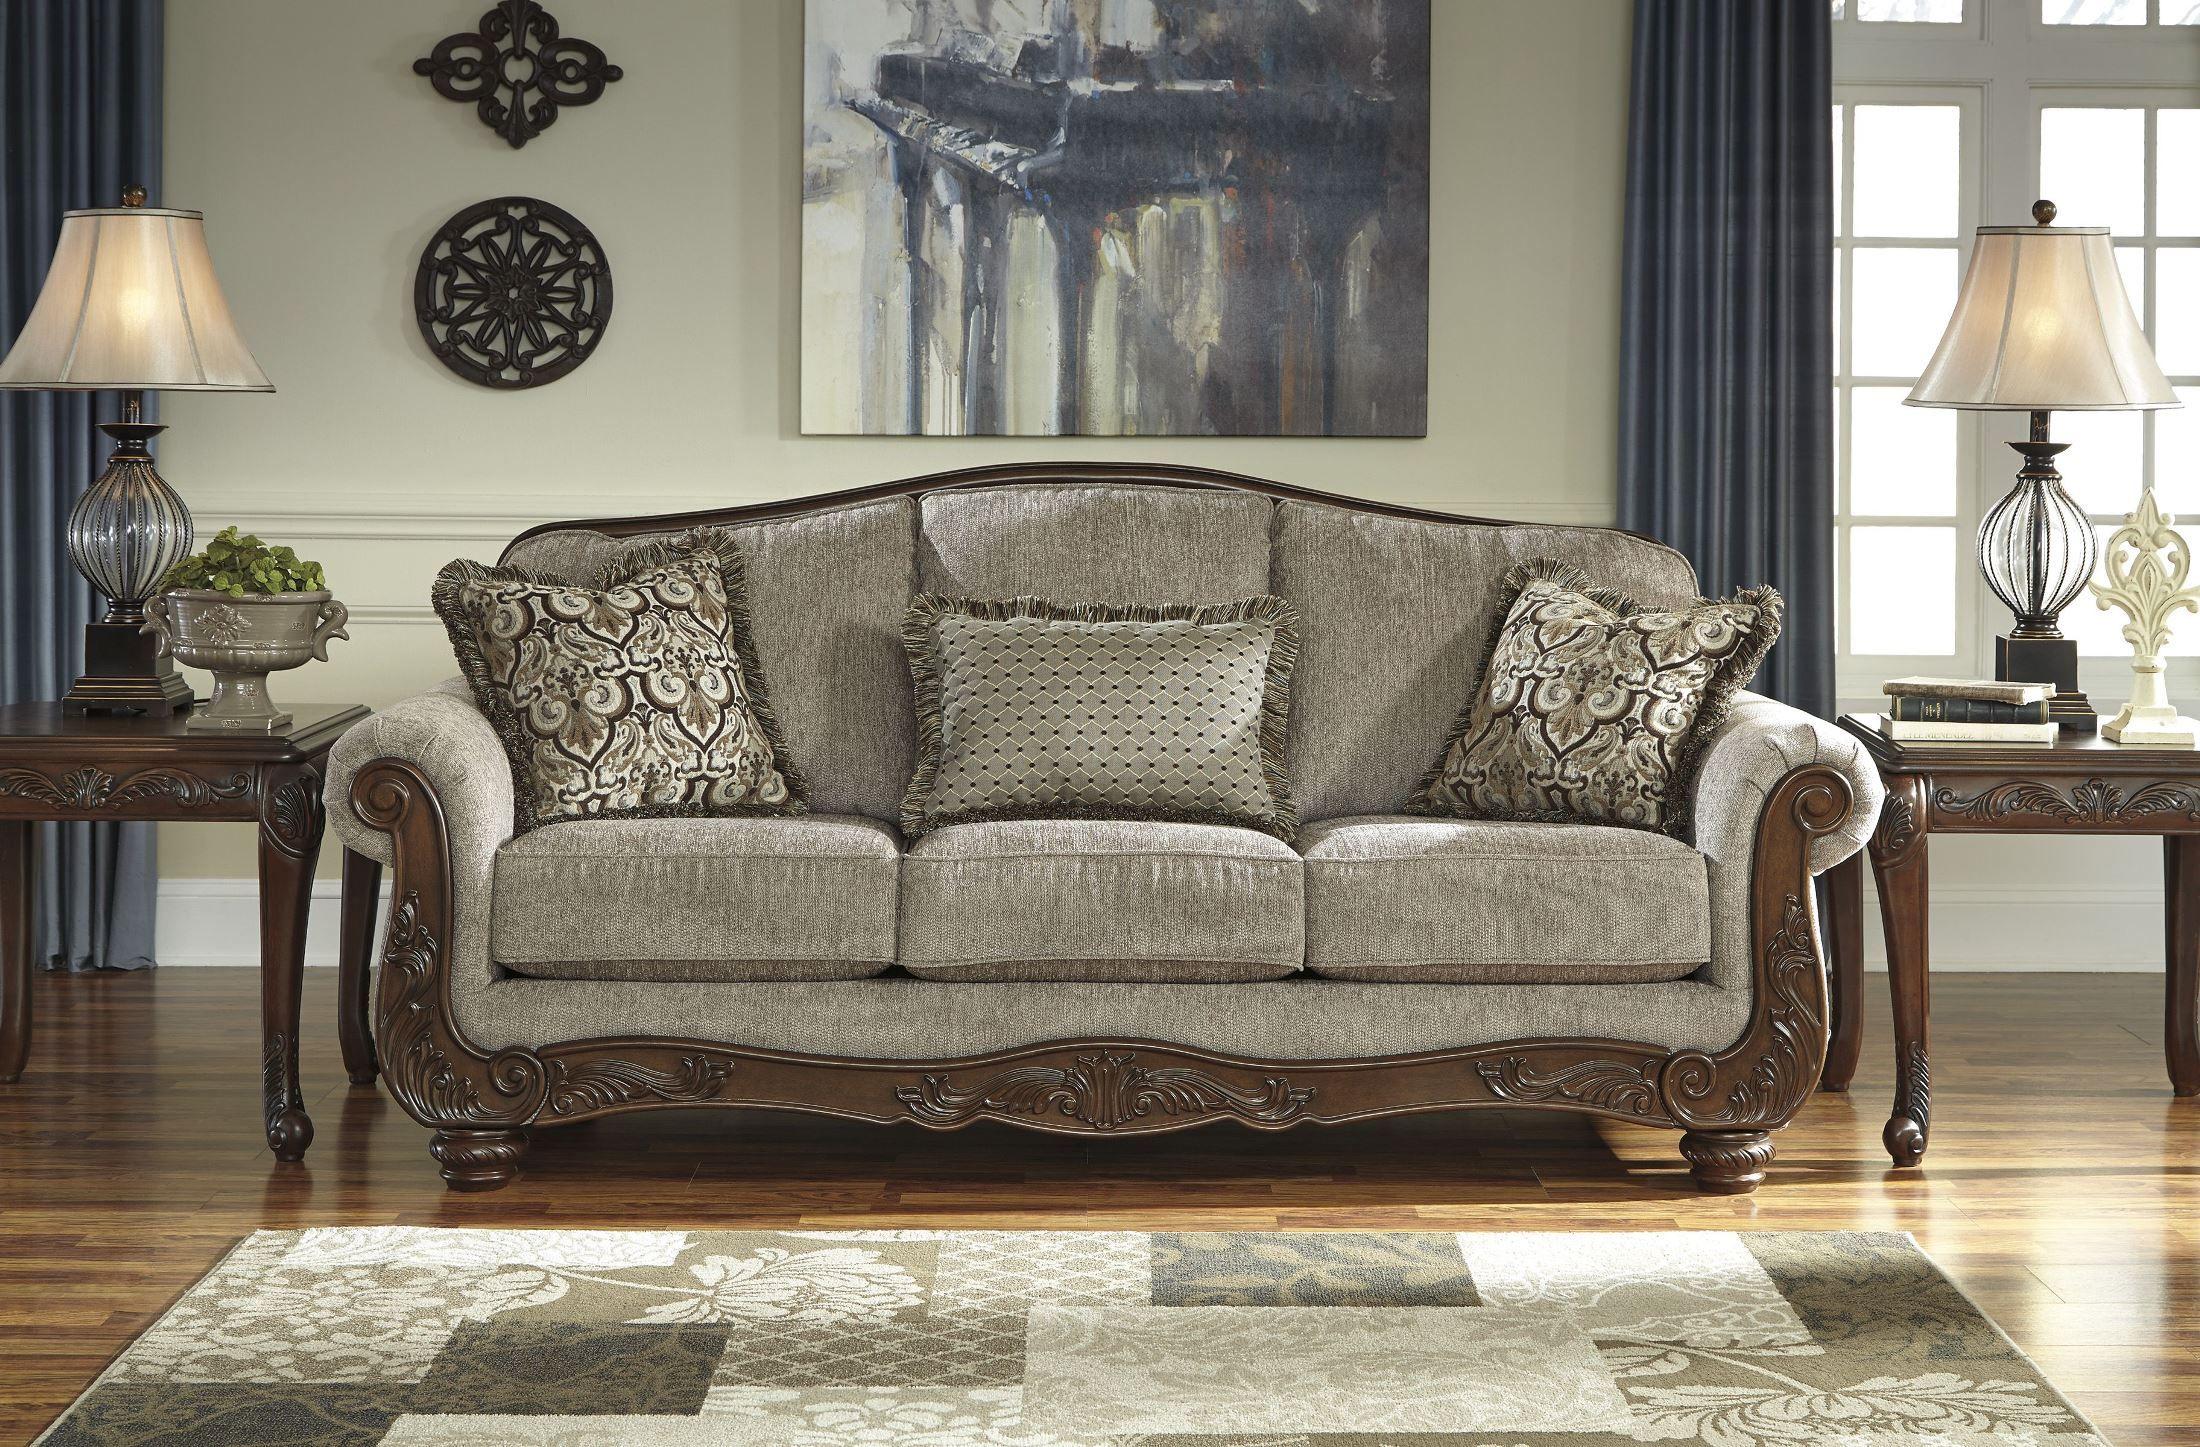 Cecilyn Cocoa Sofa In 2020 Ashley Furniture Sofas Living Room Furniture Furniture